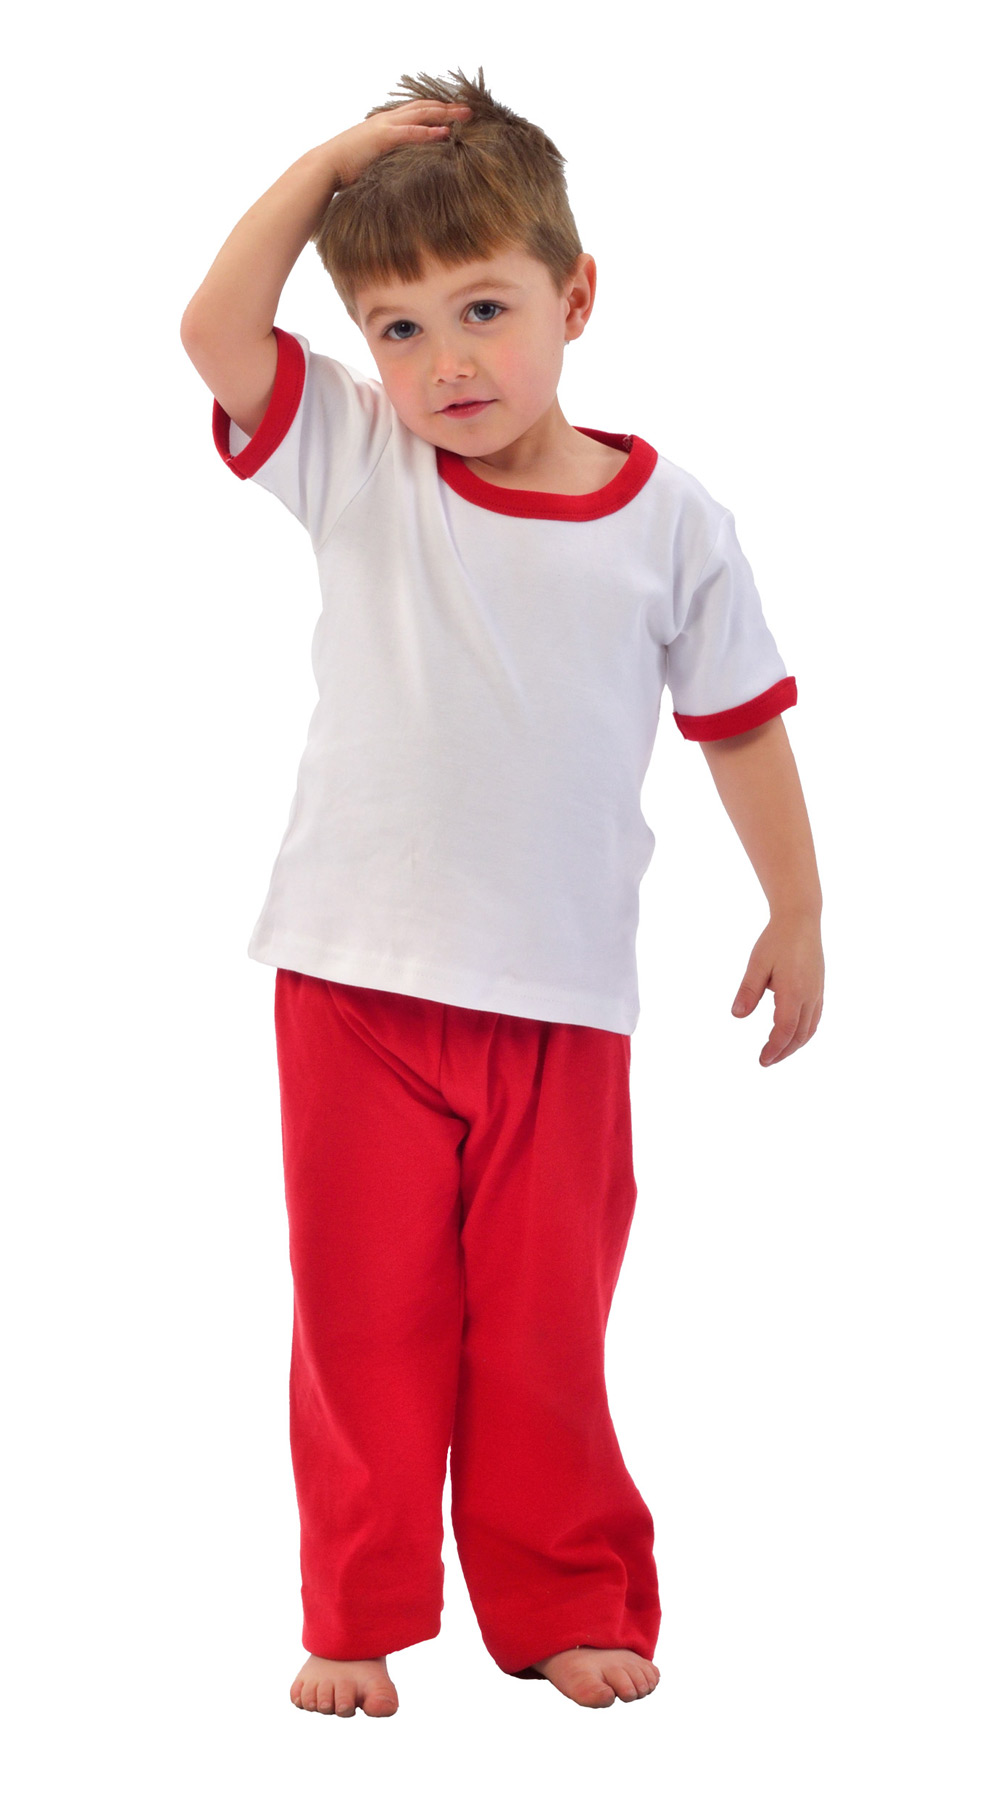 Monag 400020 连锁边短袖撞色滚边纯色T恤